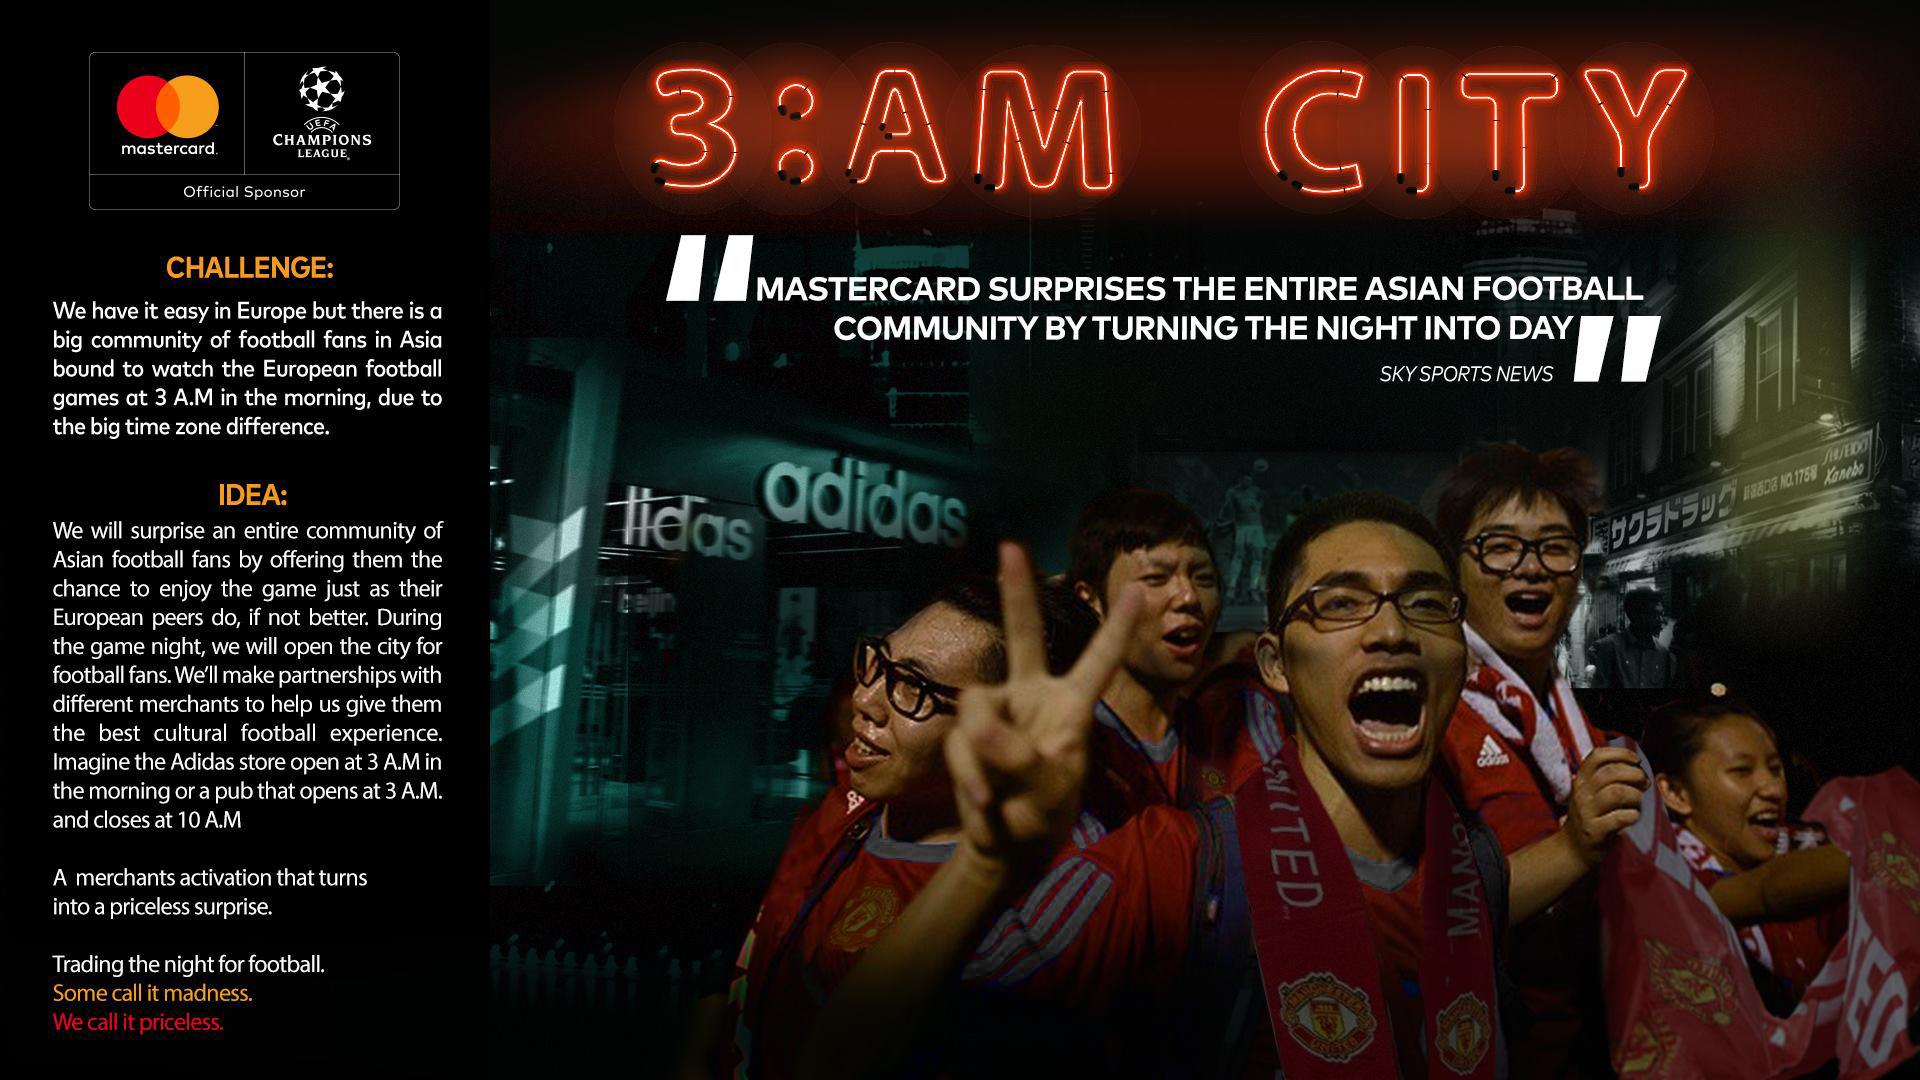 3-am-city-board-.jpg